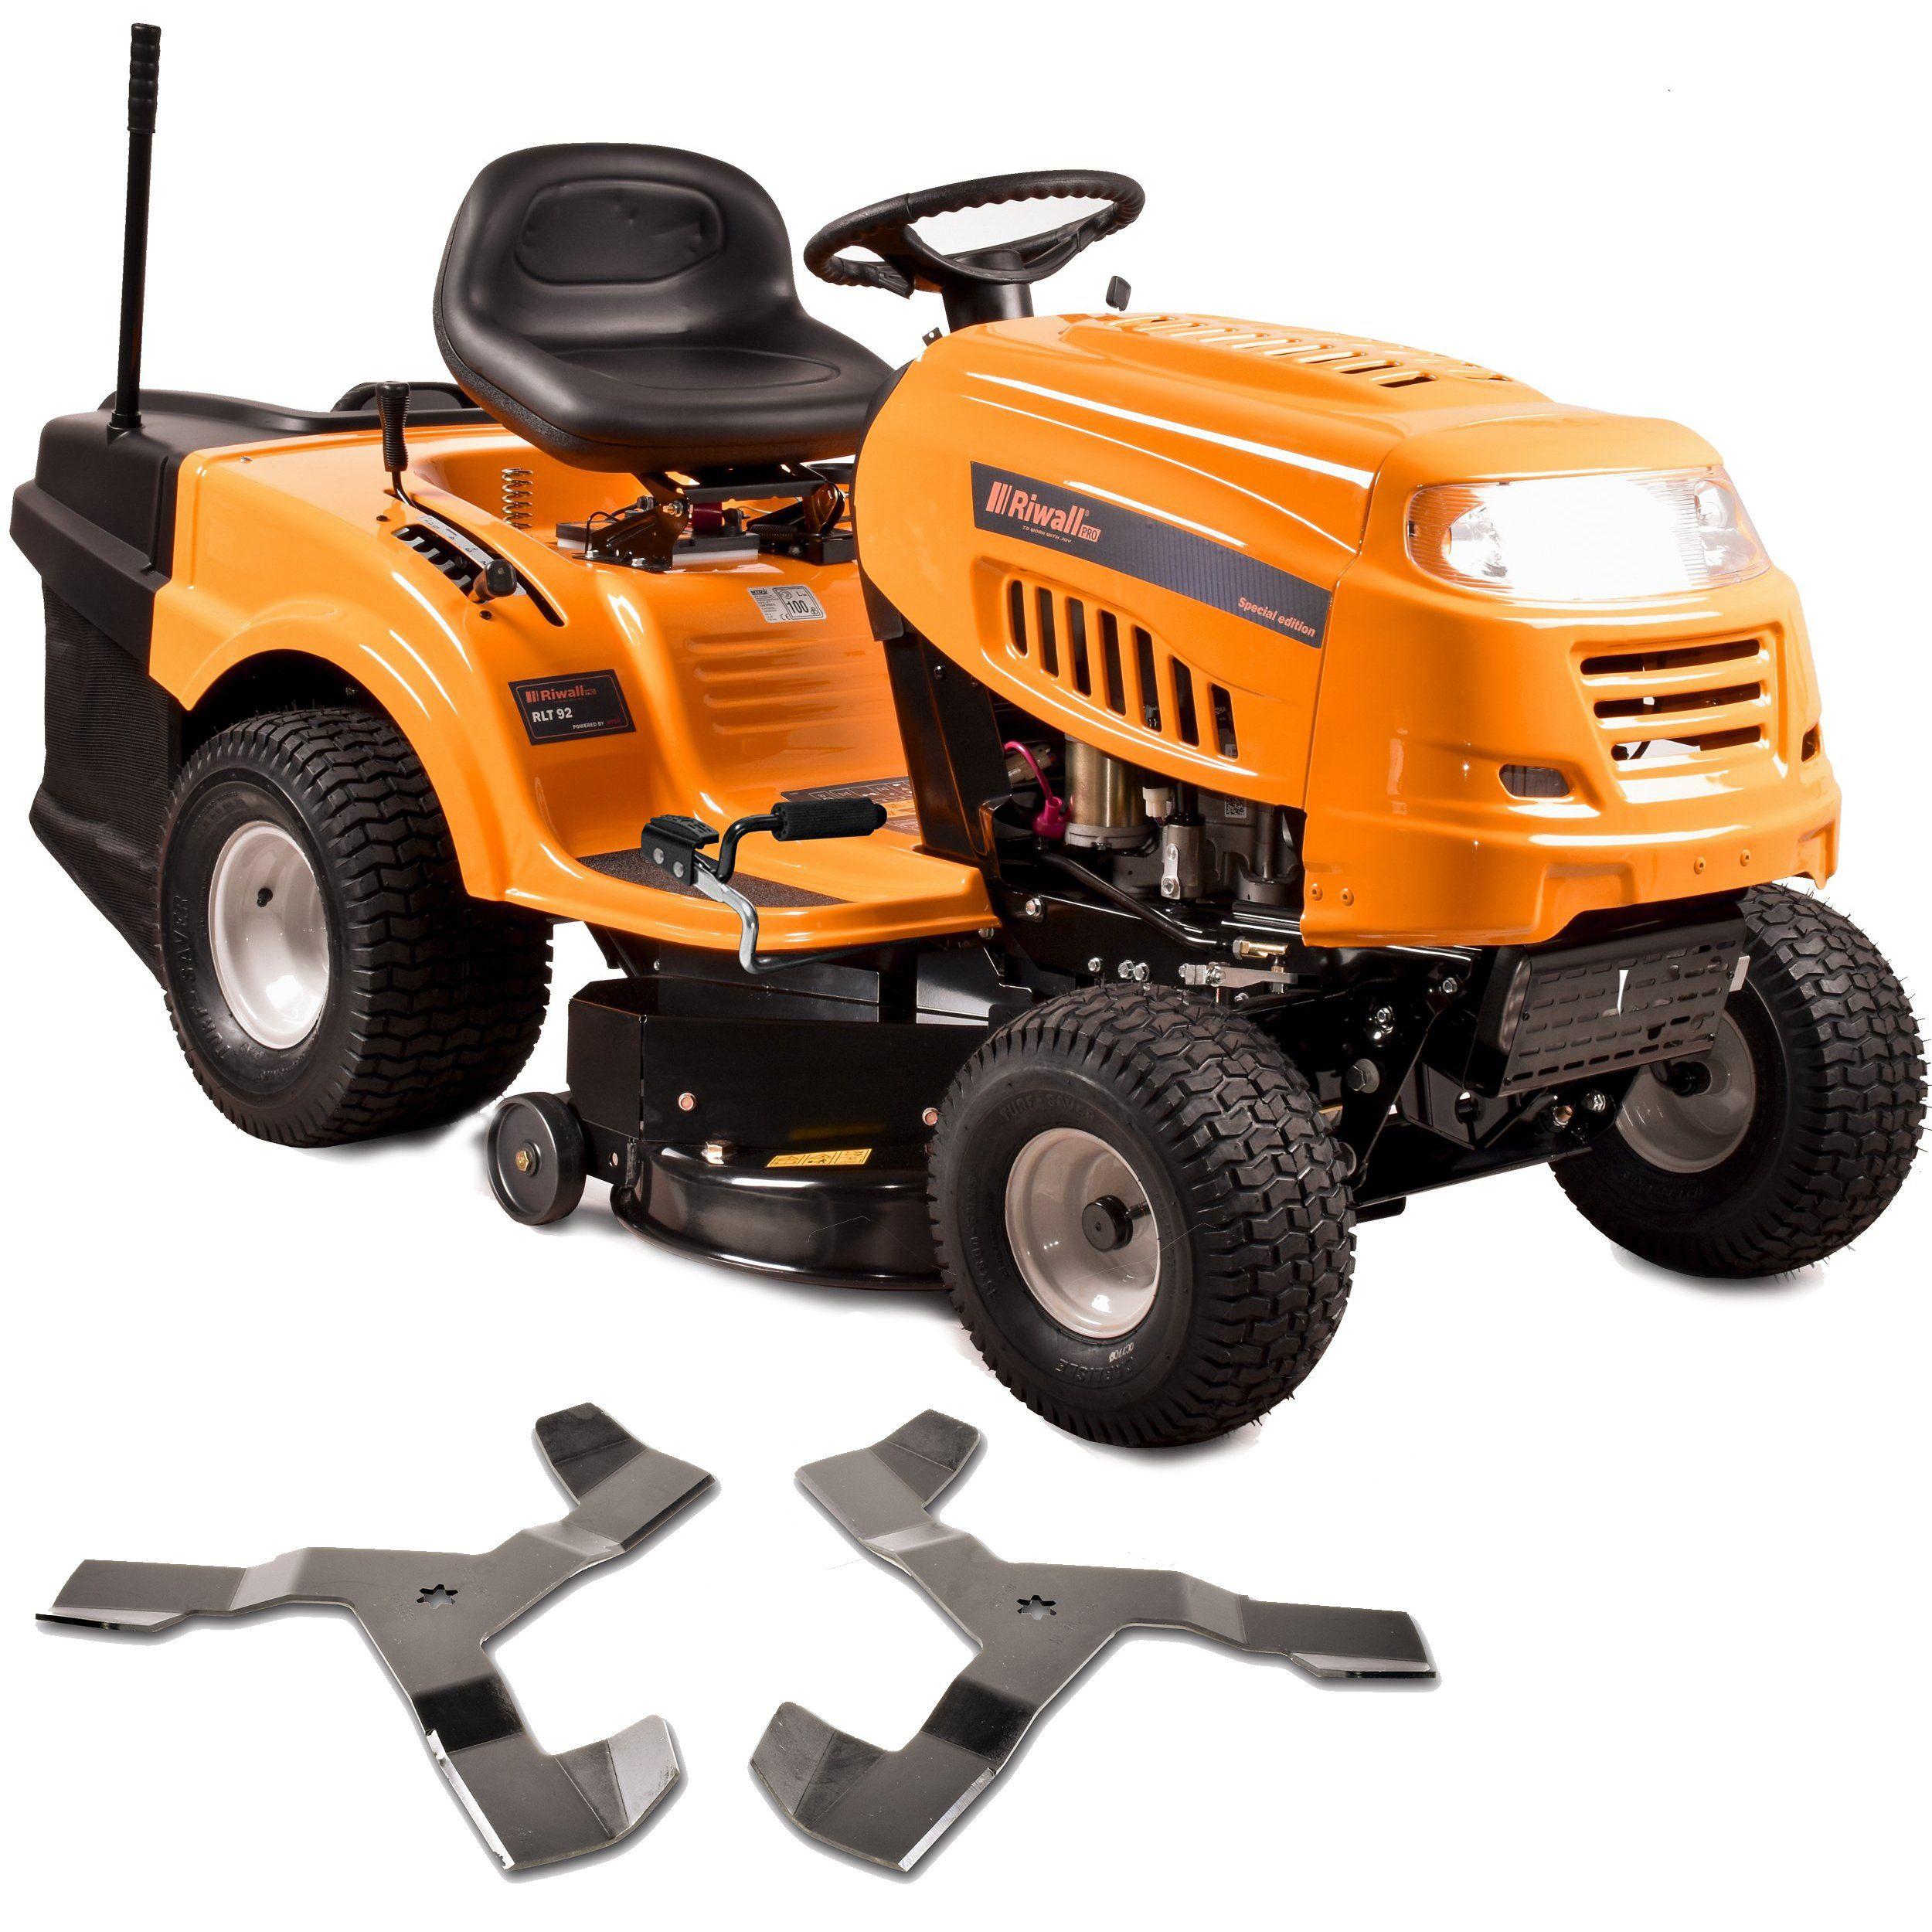 Traktorek Kosiarka Spalinowa Riwall 92h 22hp Km Ep Lawn Mower Riding Lawnmower Outdoor Power Equipment